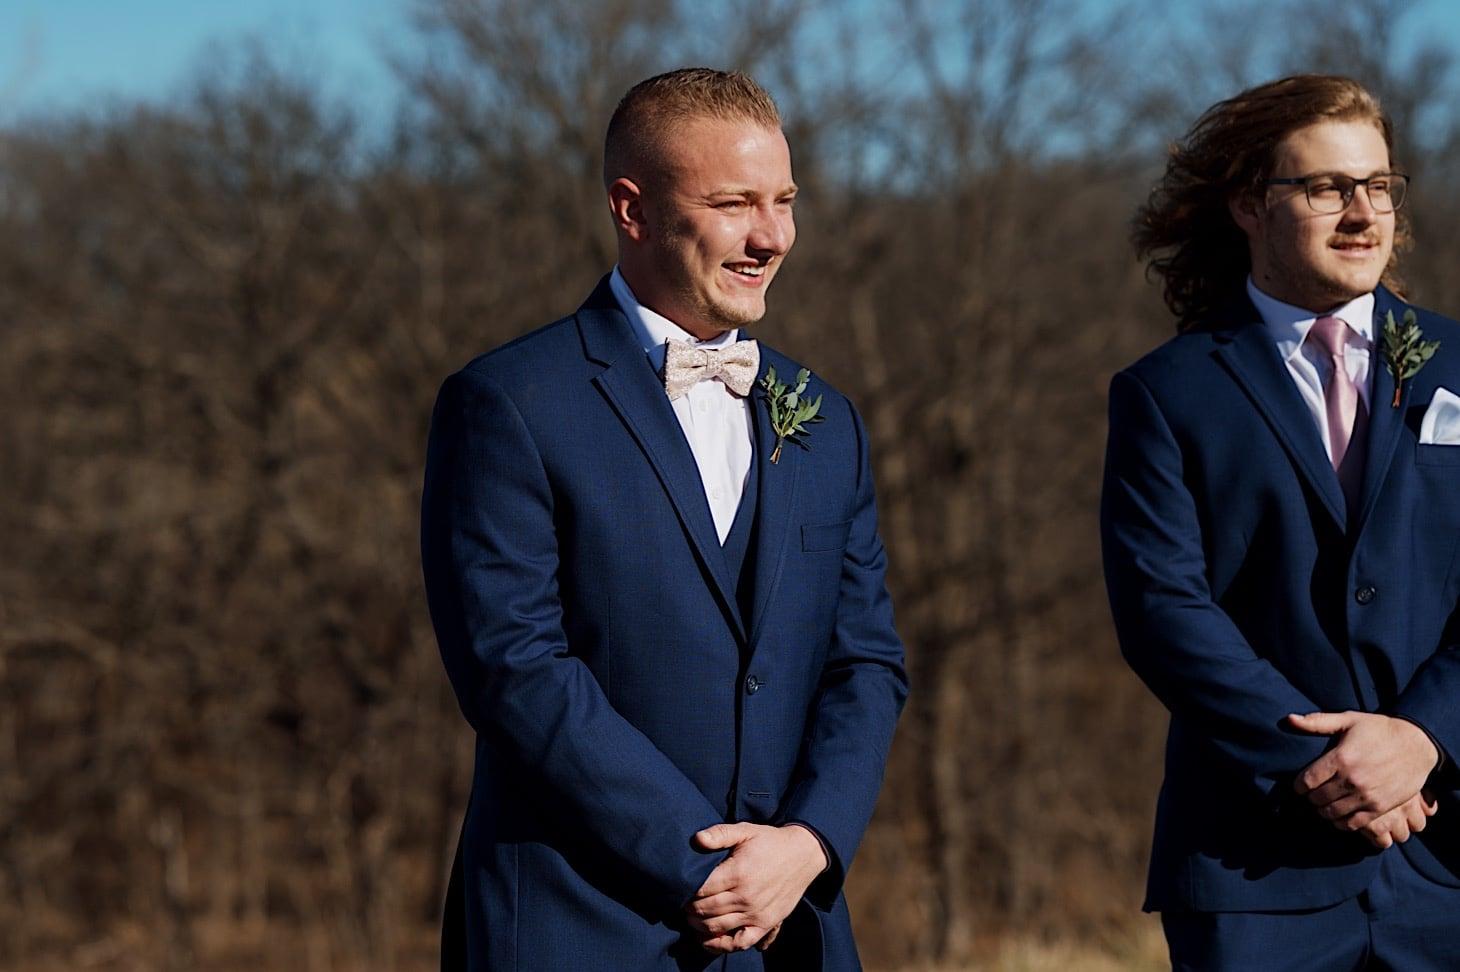 groom photo